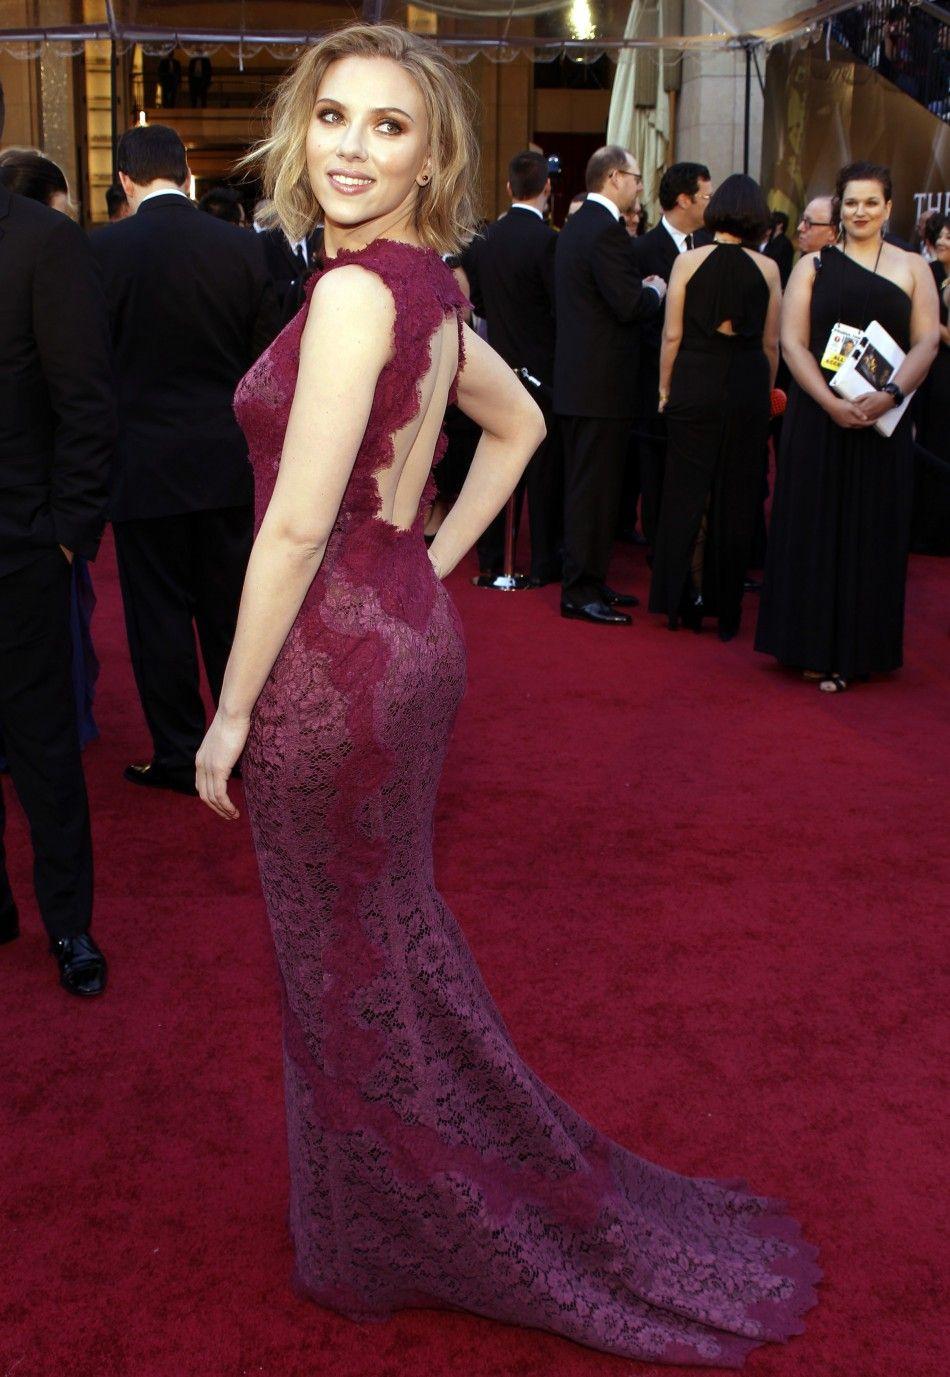 Scarlett Johansson Oscars  2011 Red Carpet in 2019 Scarlett 950x1377